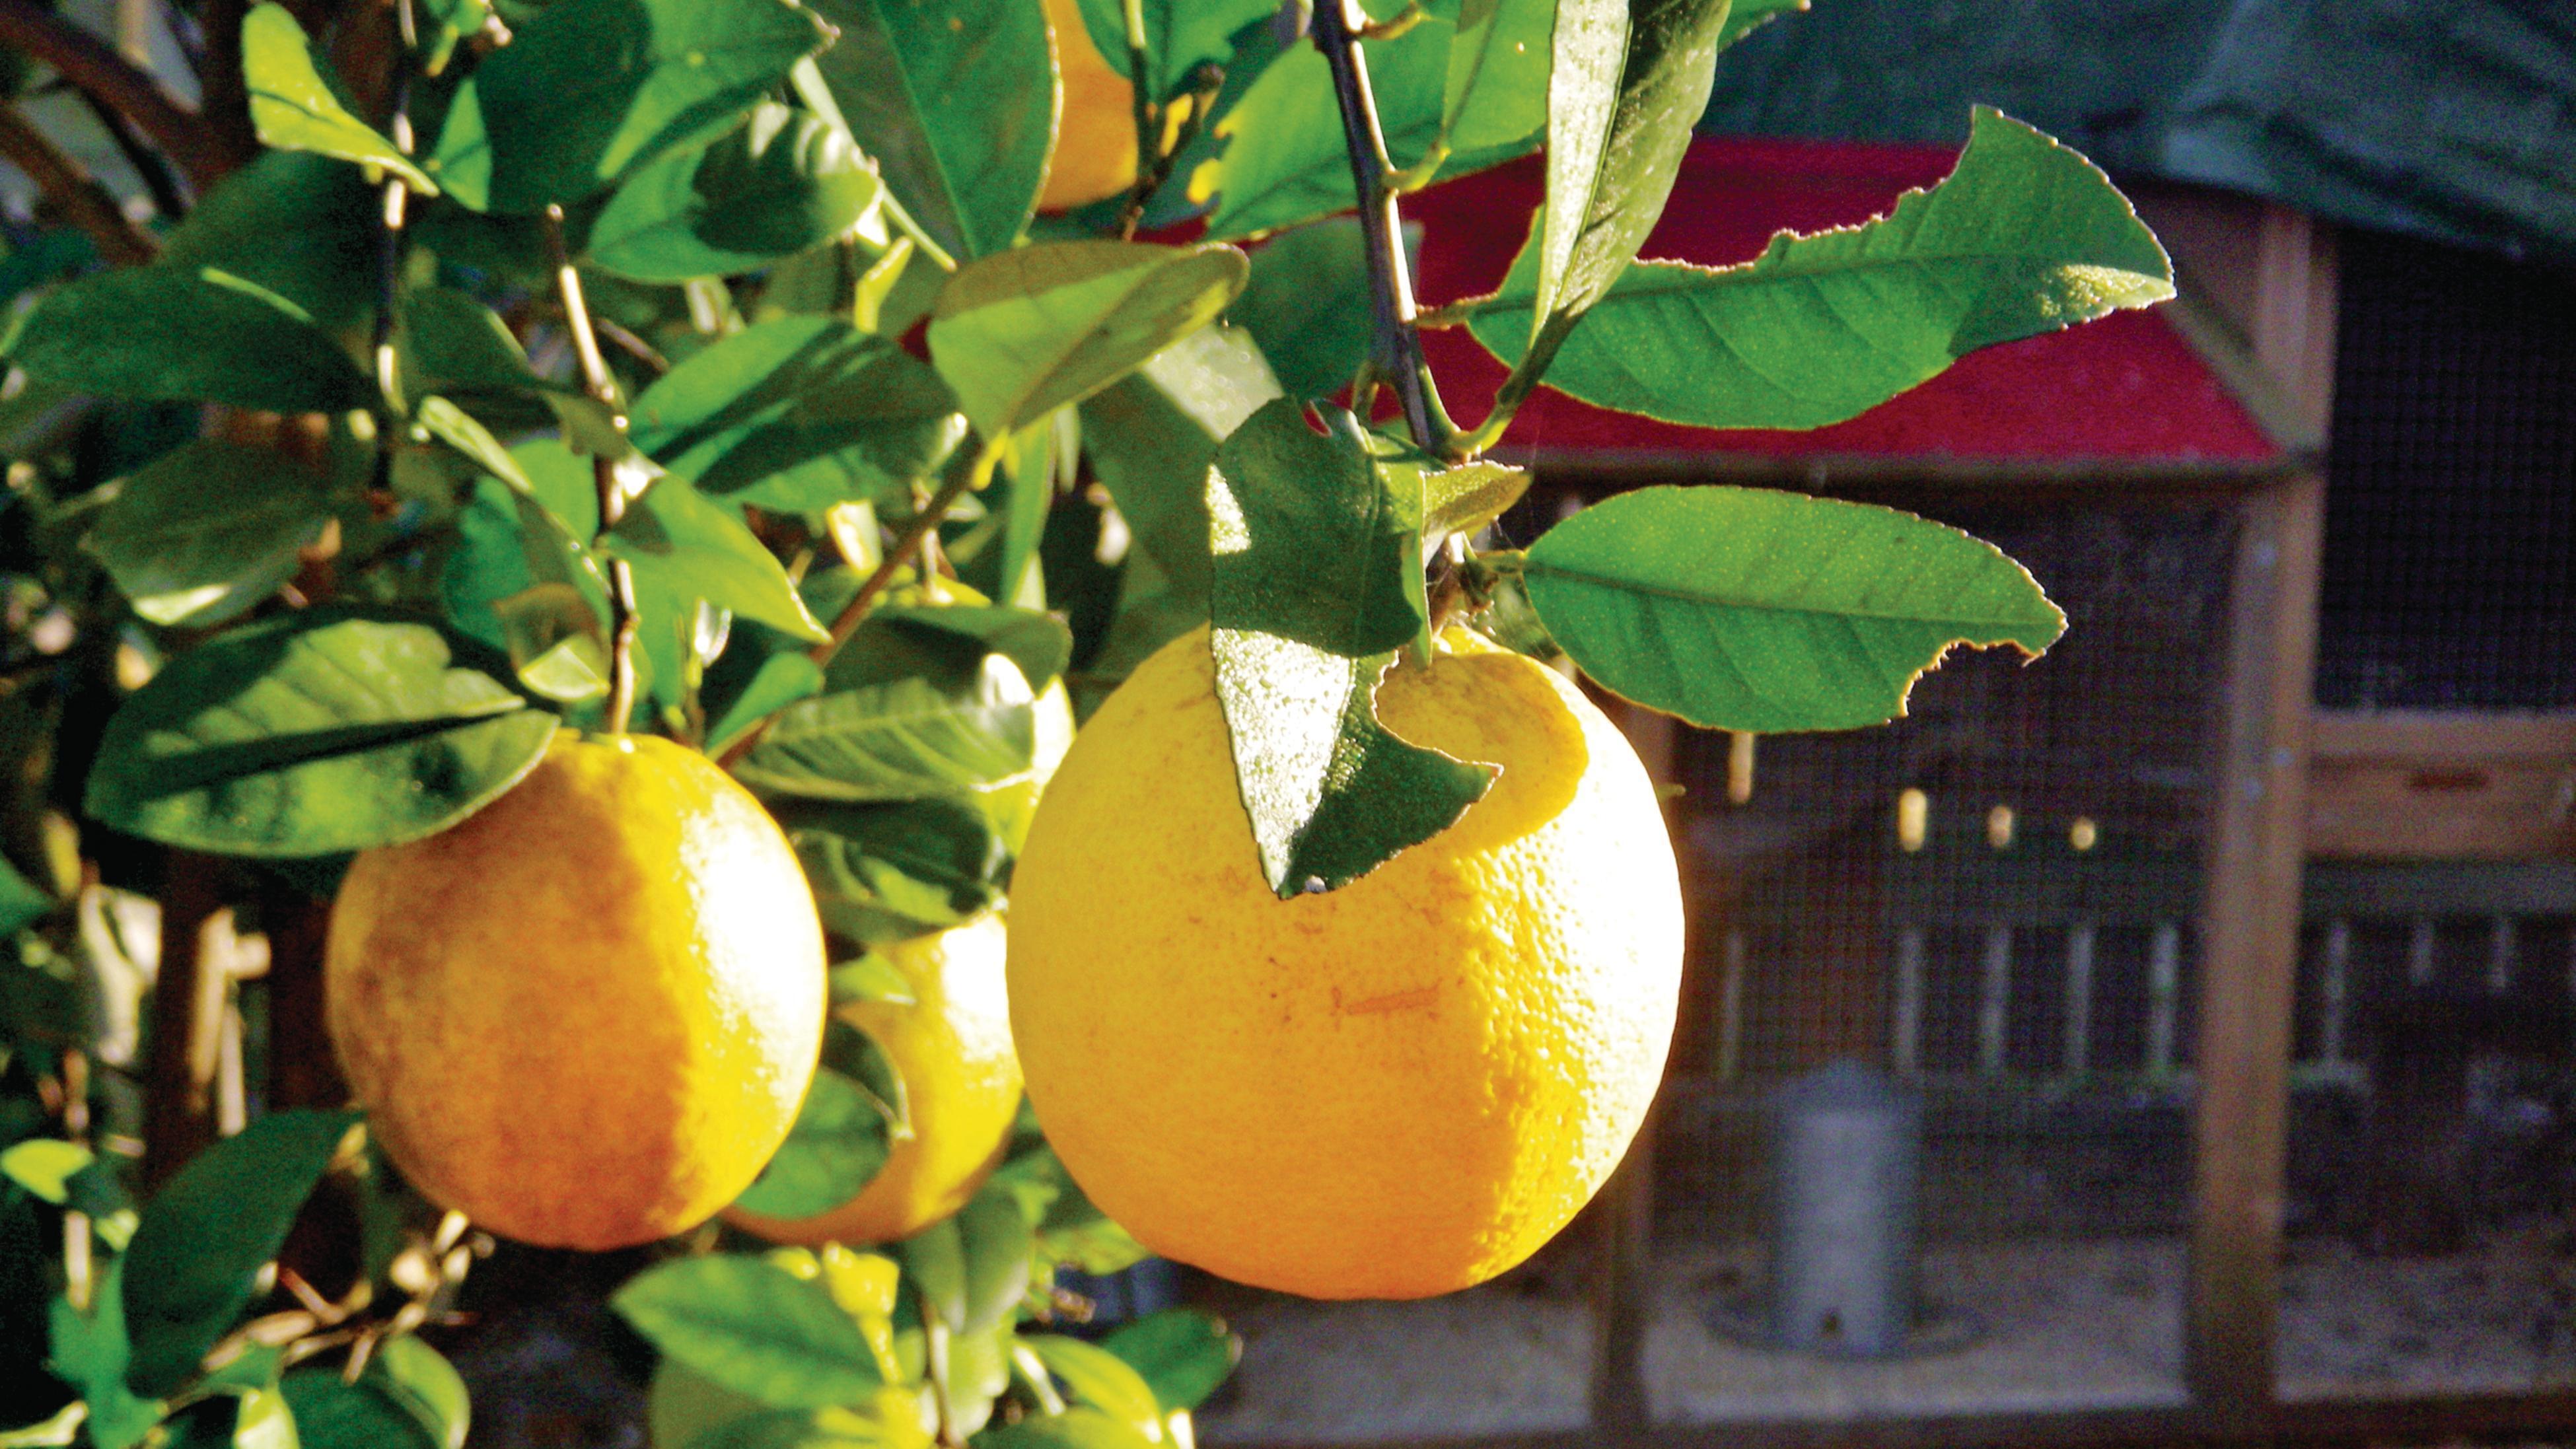 Lemons growing on a tree.